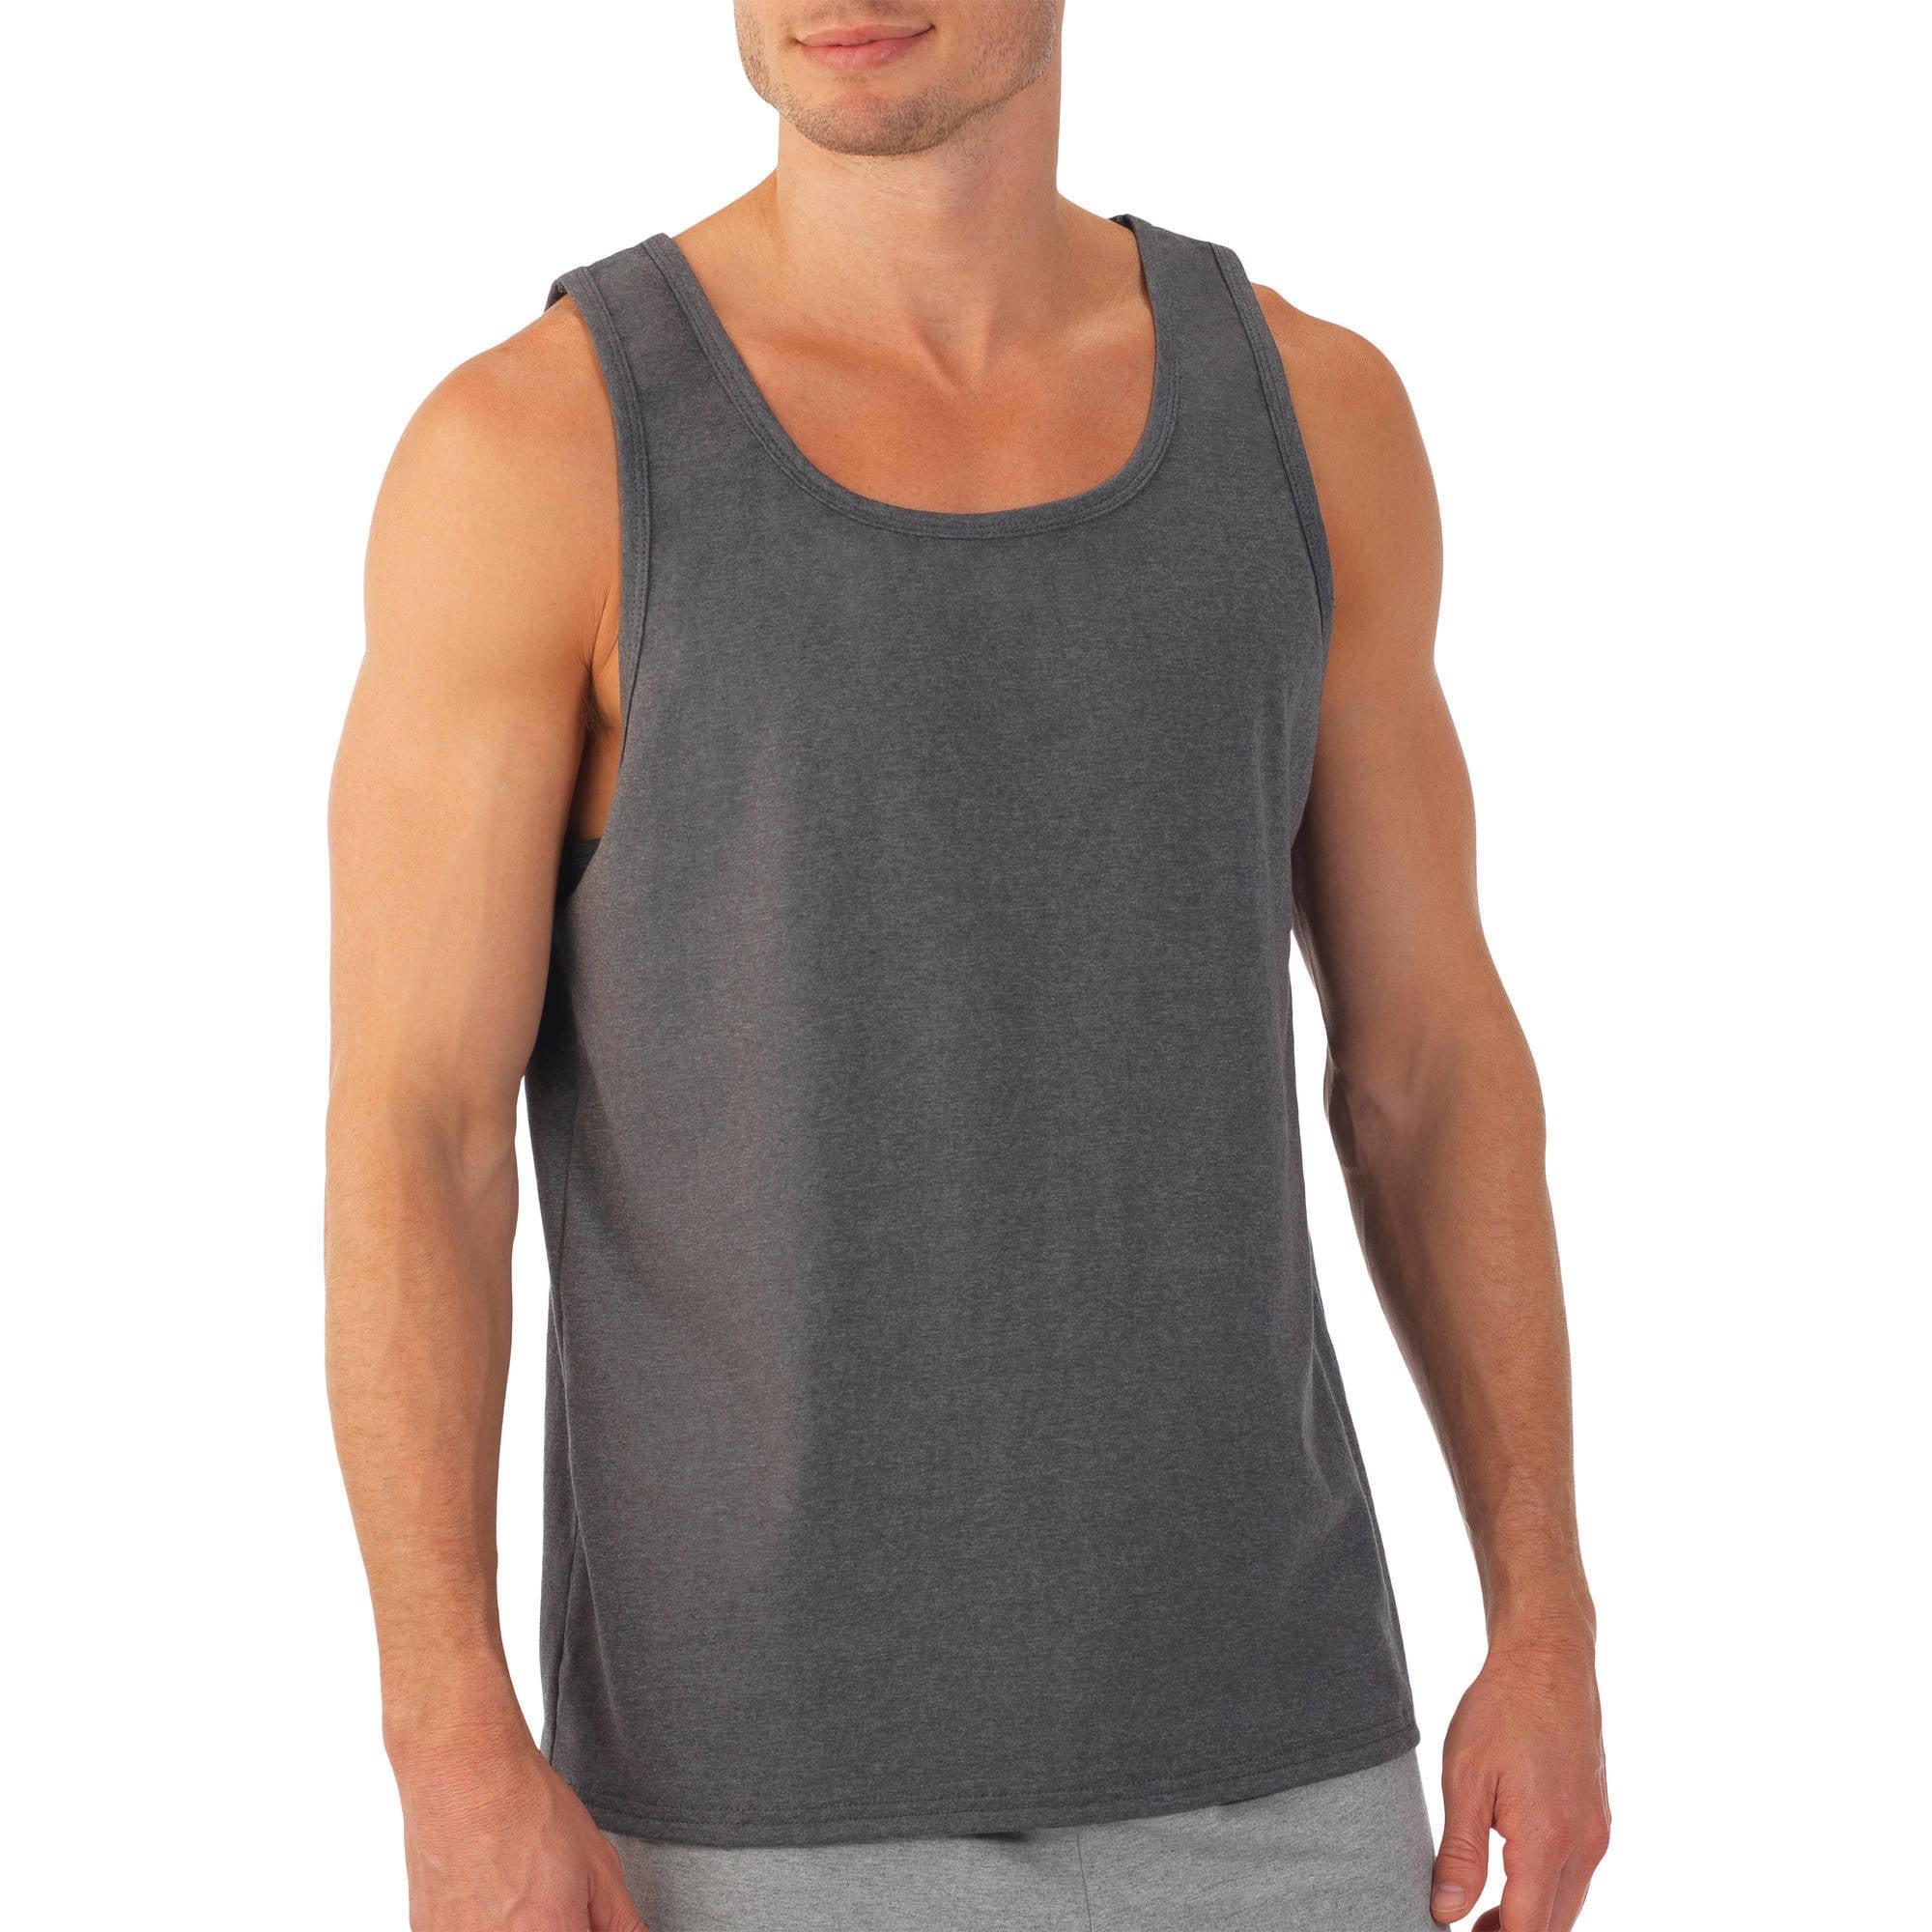 Quints Shark Fishing Mens Printed Vest Sports Tank-Top Shirts Leisure Sleeveless Shirt